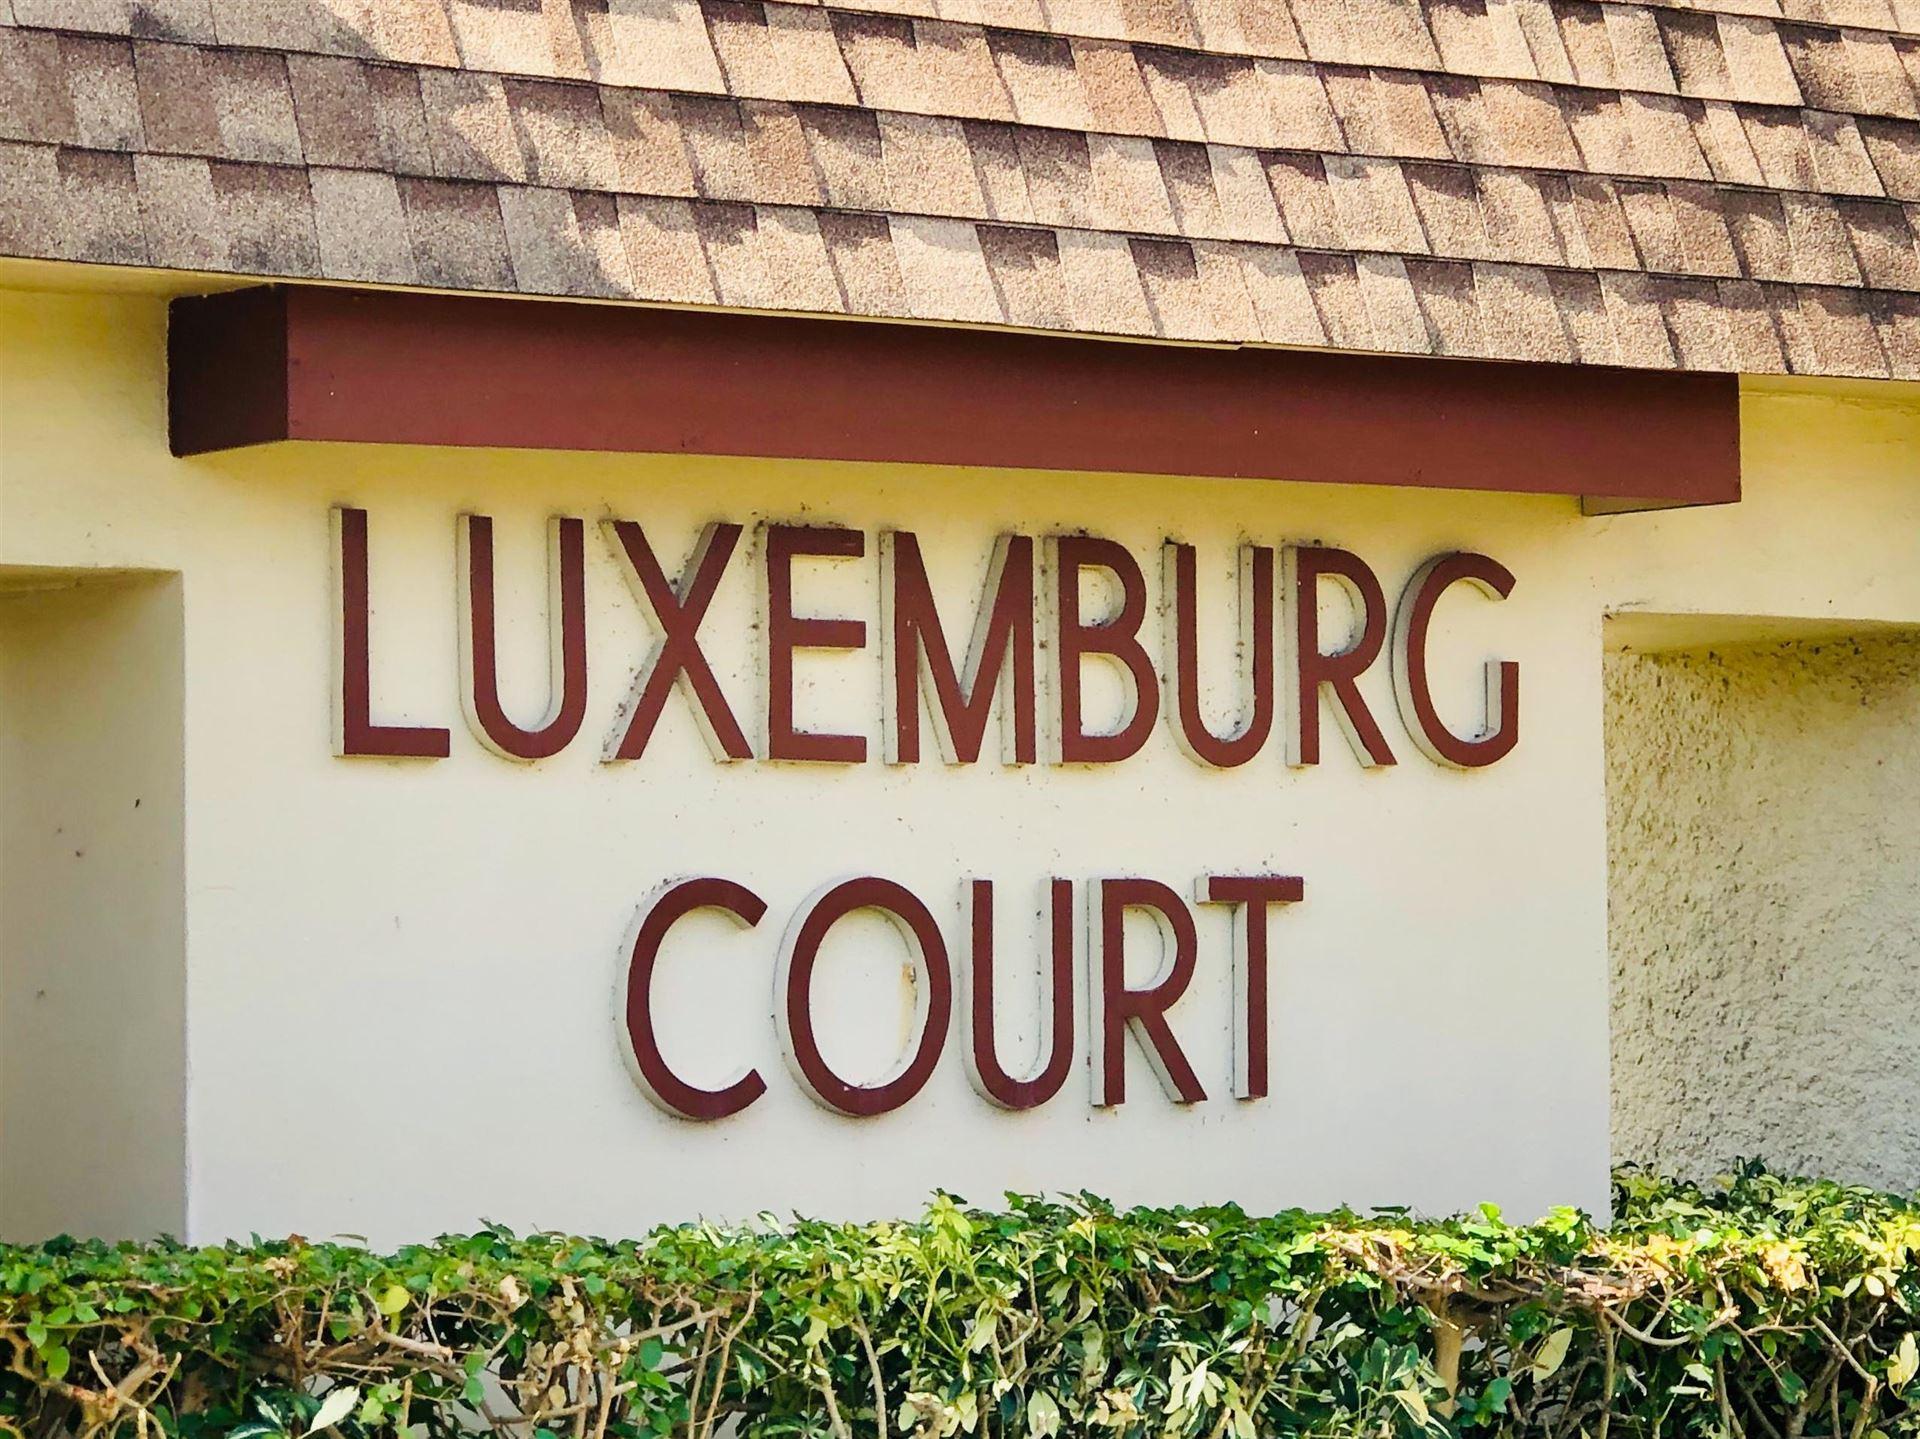 4483 Luxemburg Court #205, Lake Worth, FL 33467 - #: RX-10594895